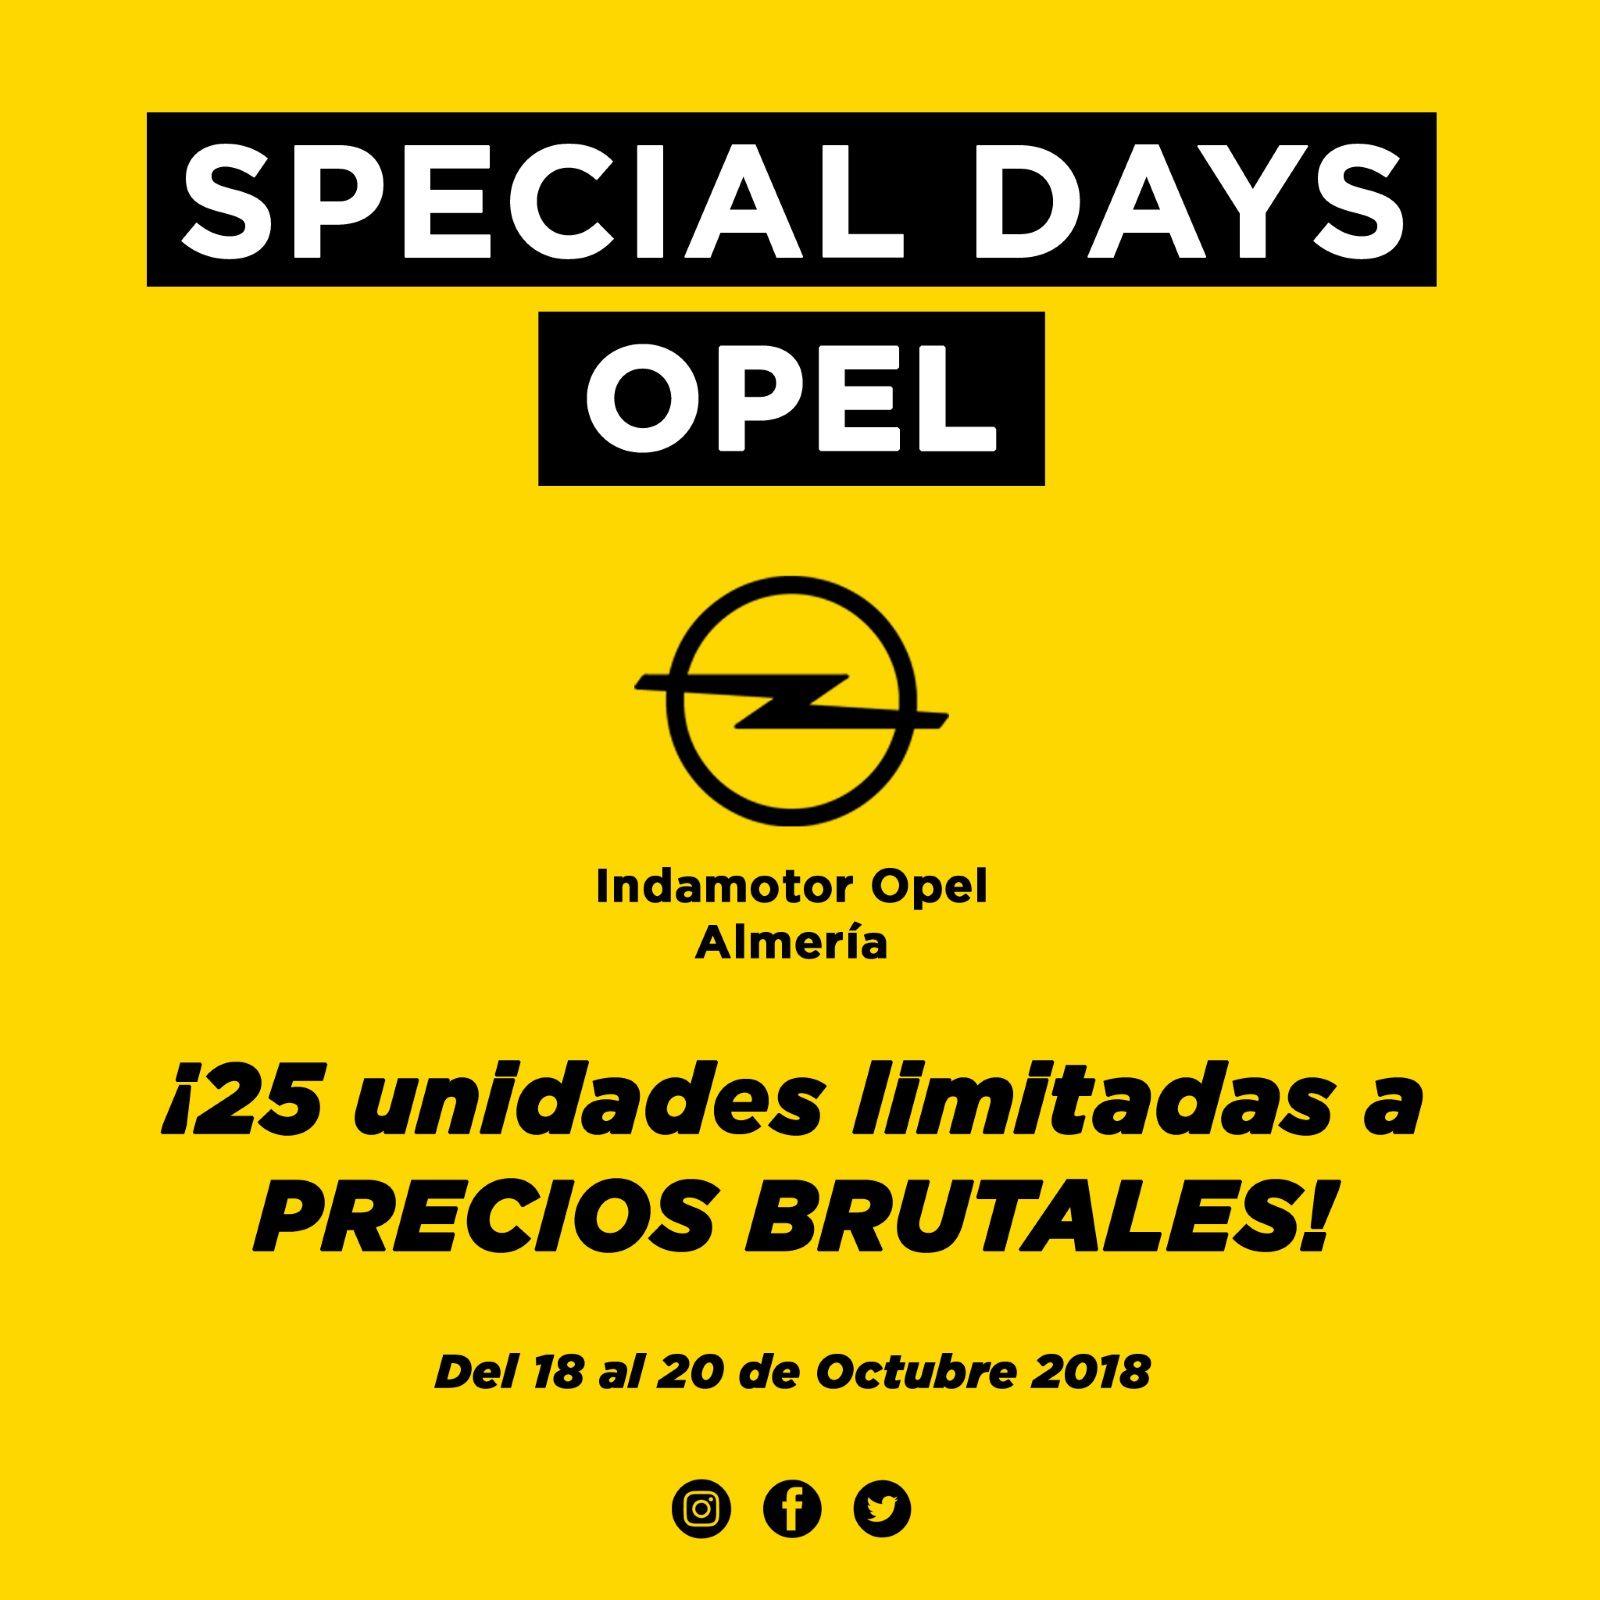 SPECIAL DAYS. DEL 18 AL 20 DE OCTUBRE